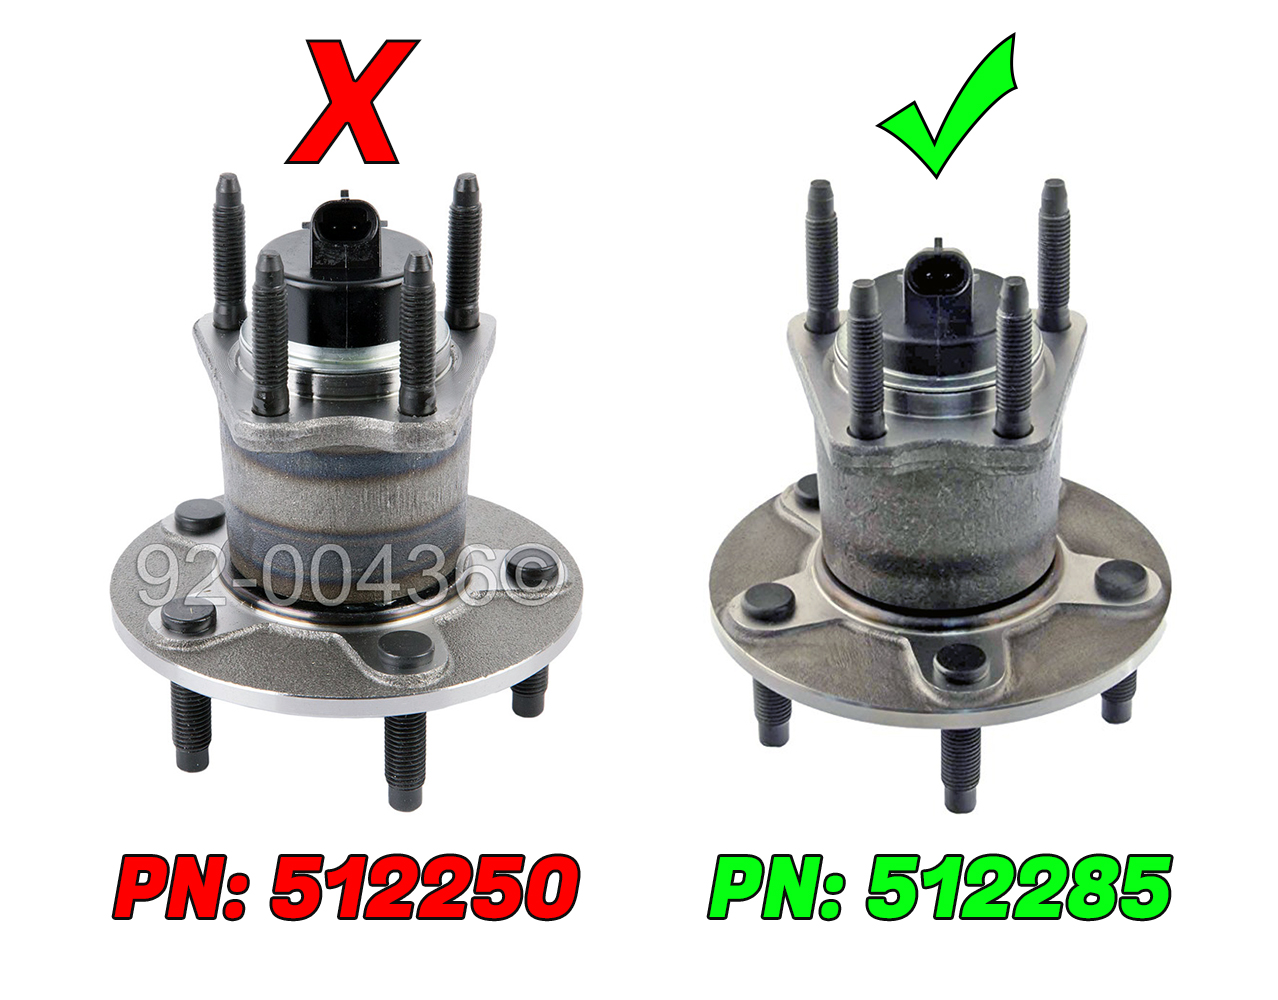 abs hubs compared.jpg